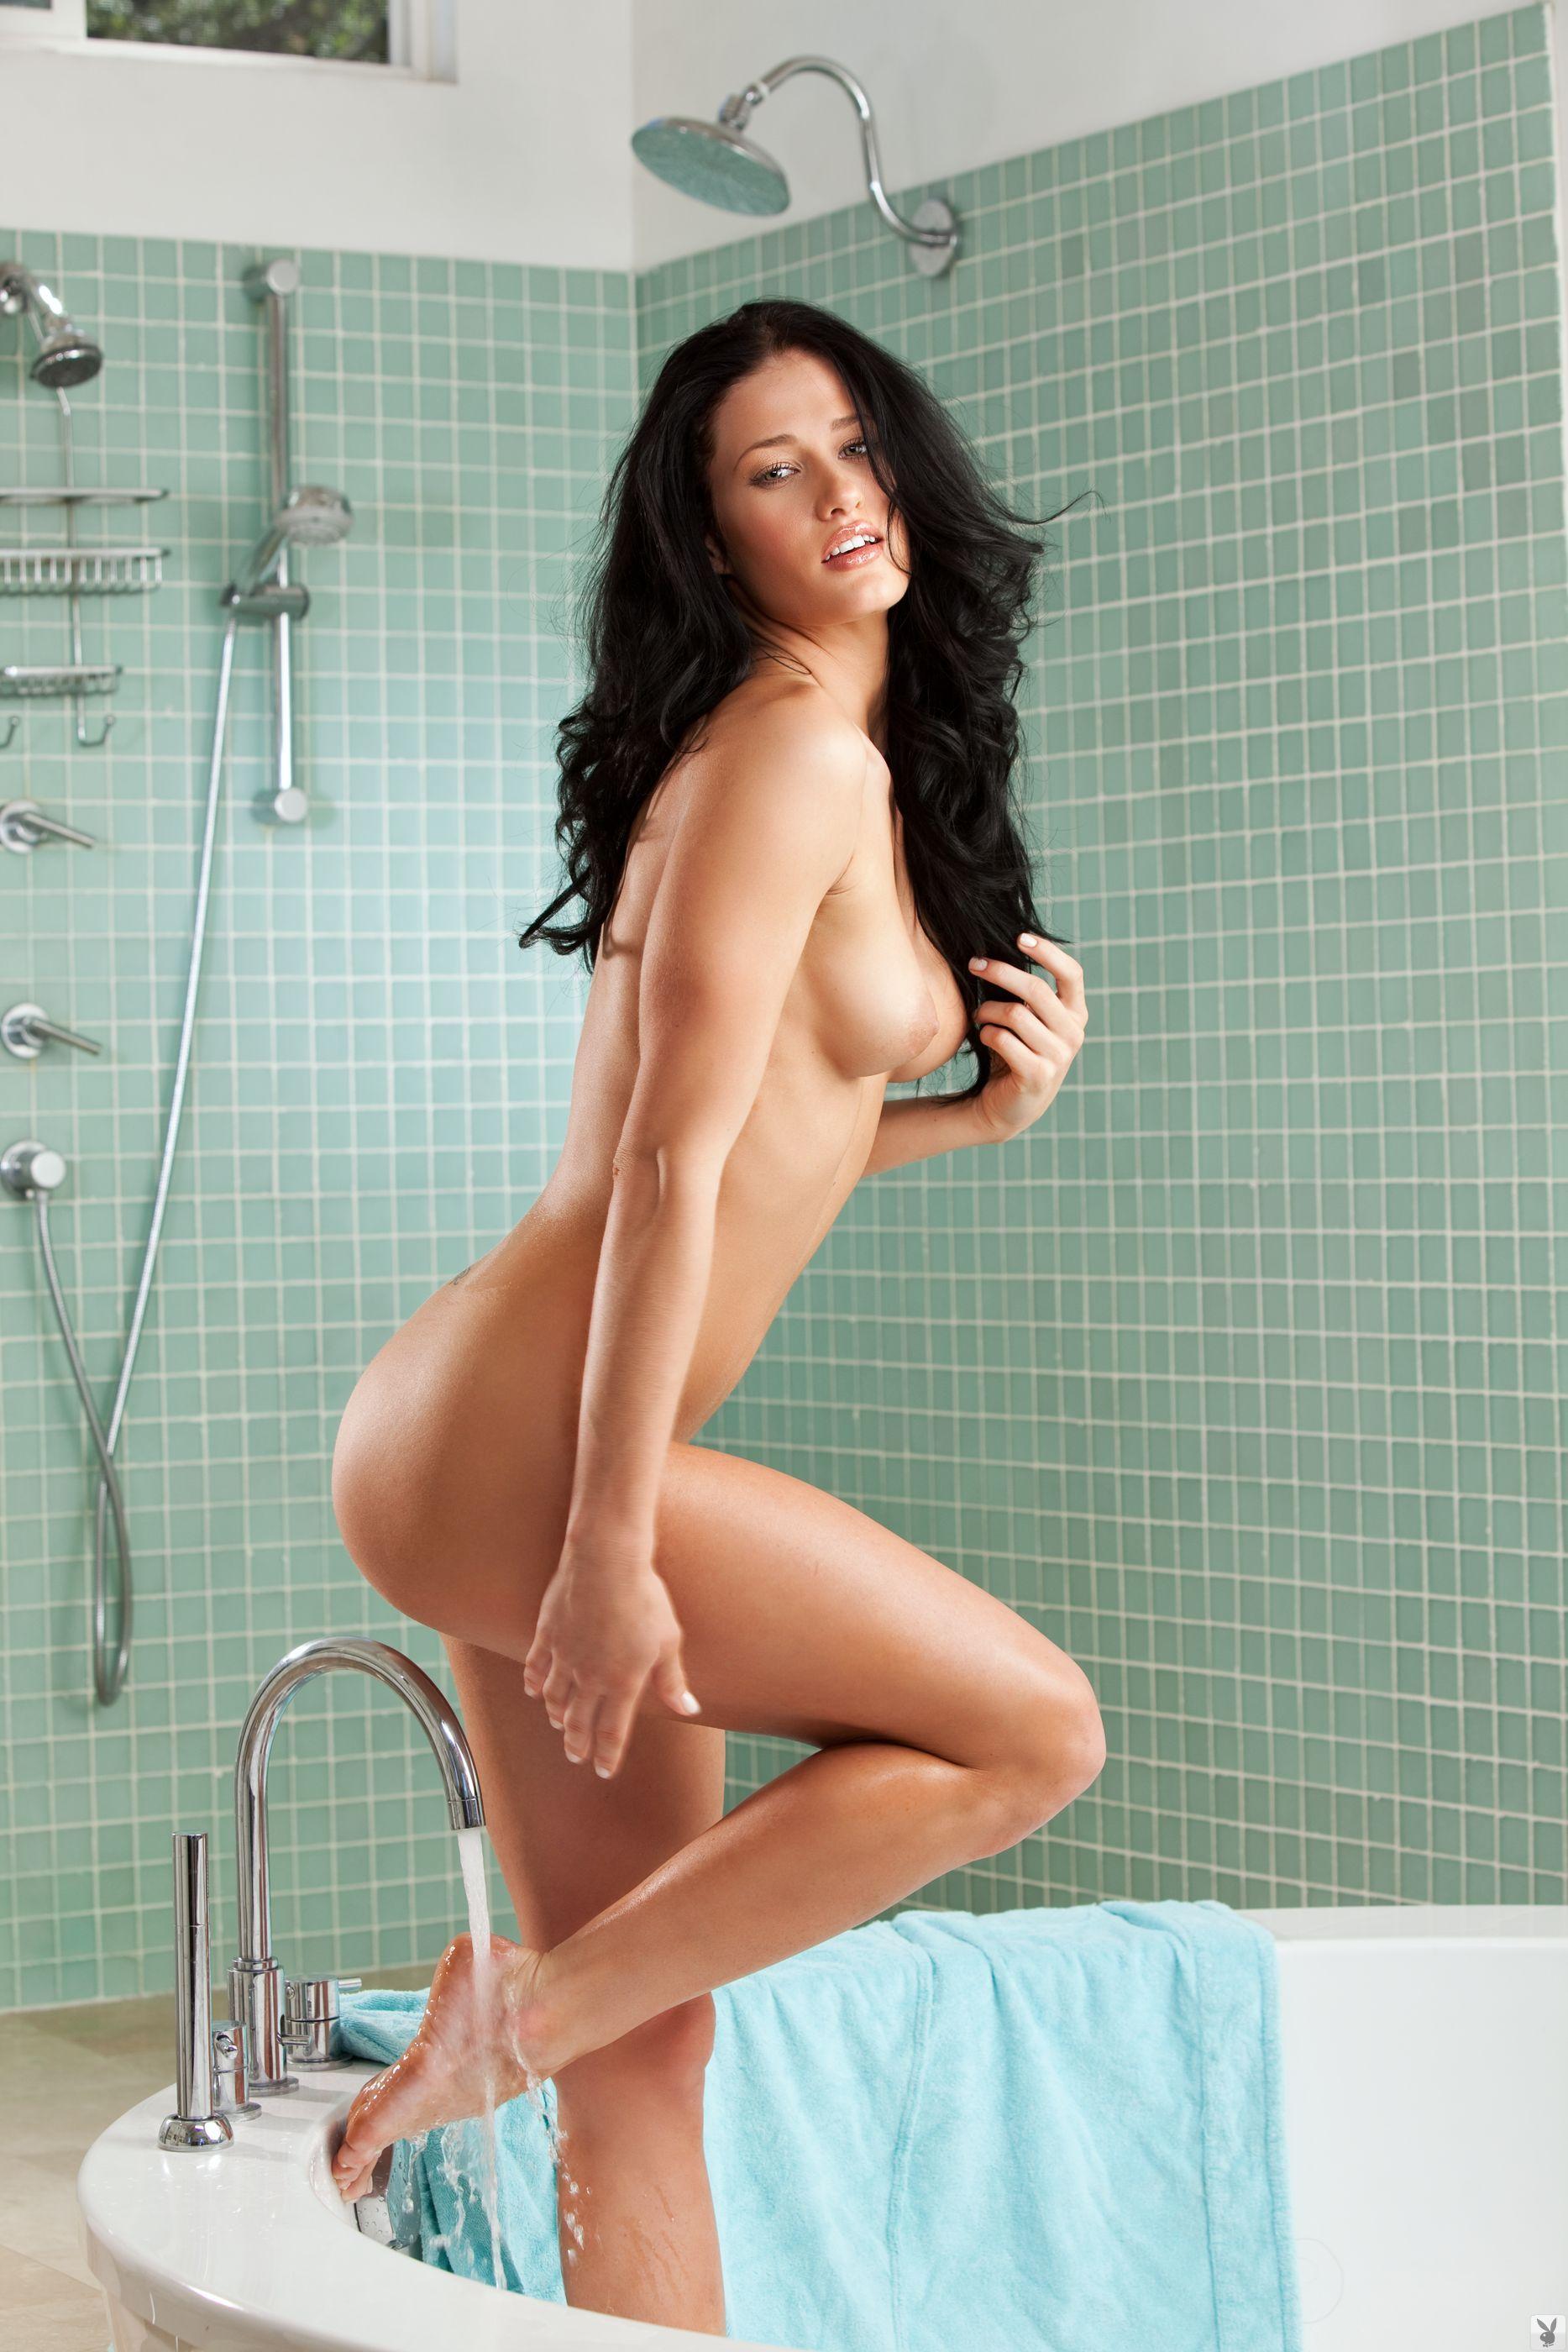 ashton-winters-brunette-nude-bathroom-playboy-24